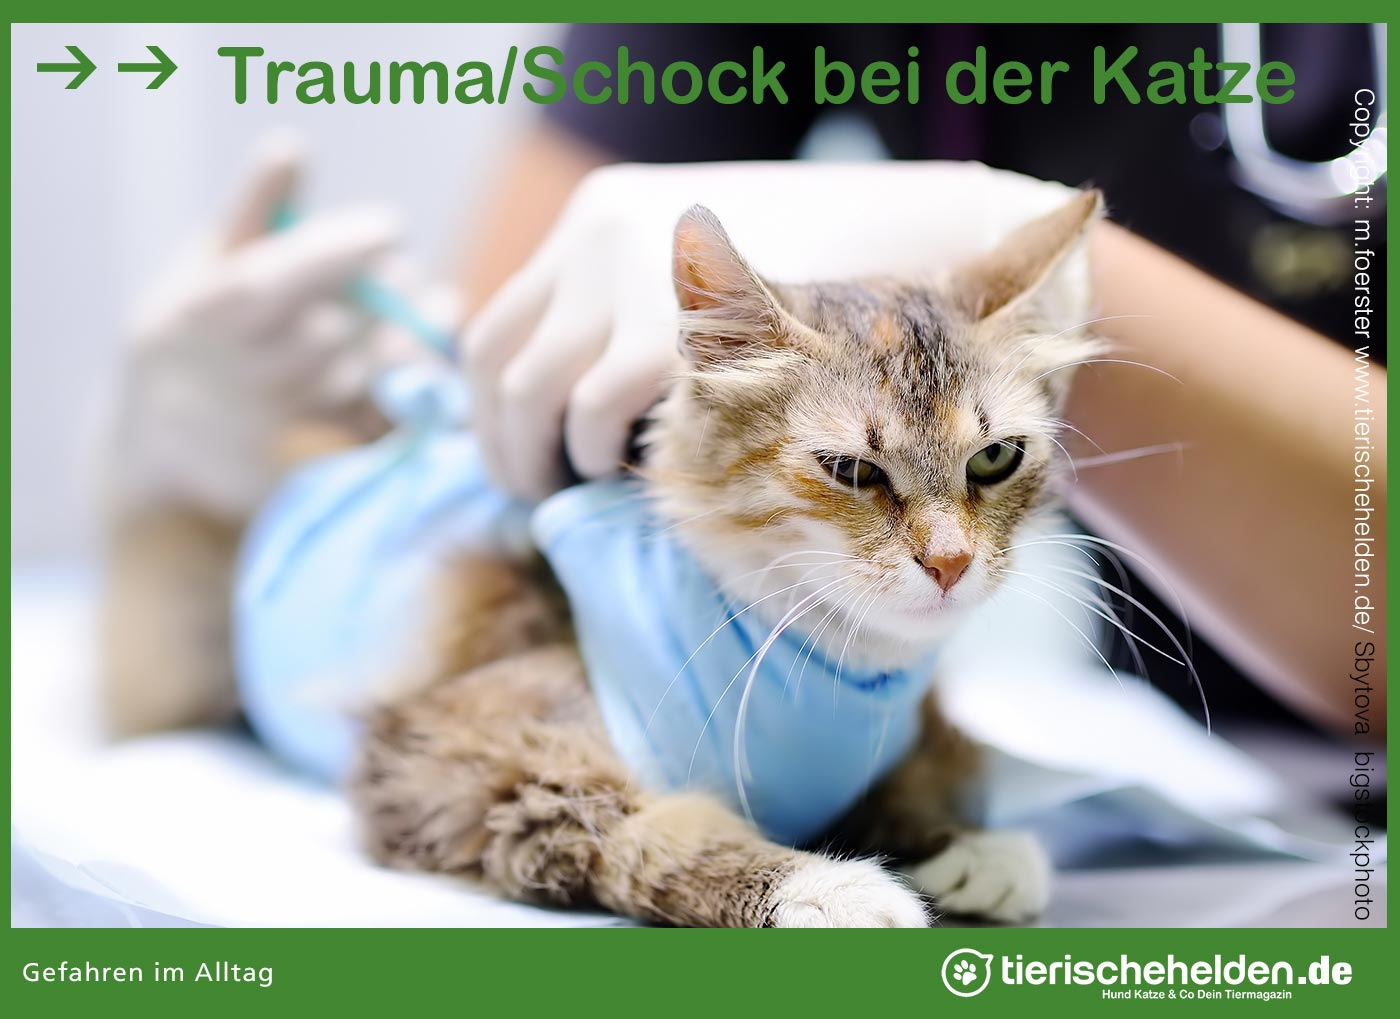 Traumatisierte Katze